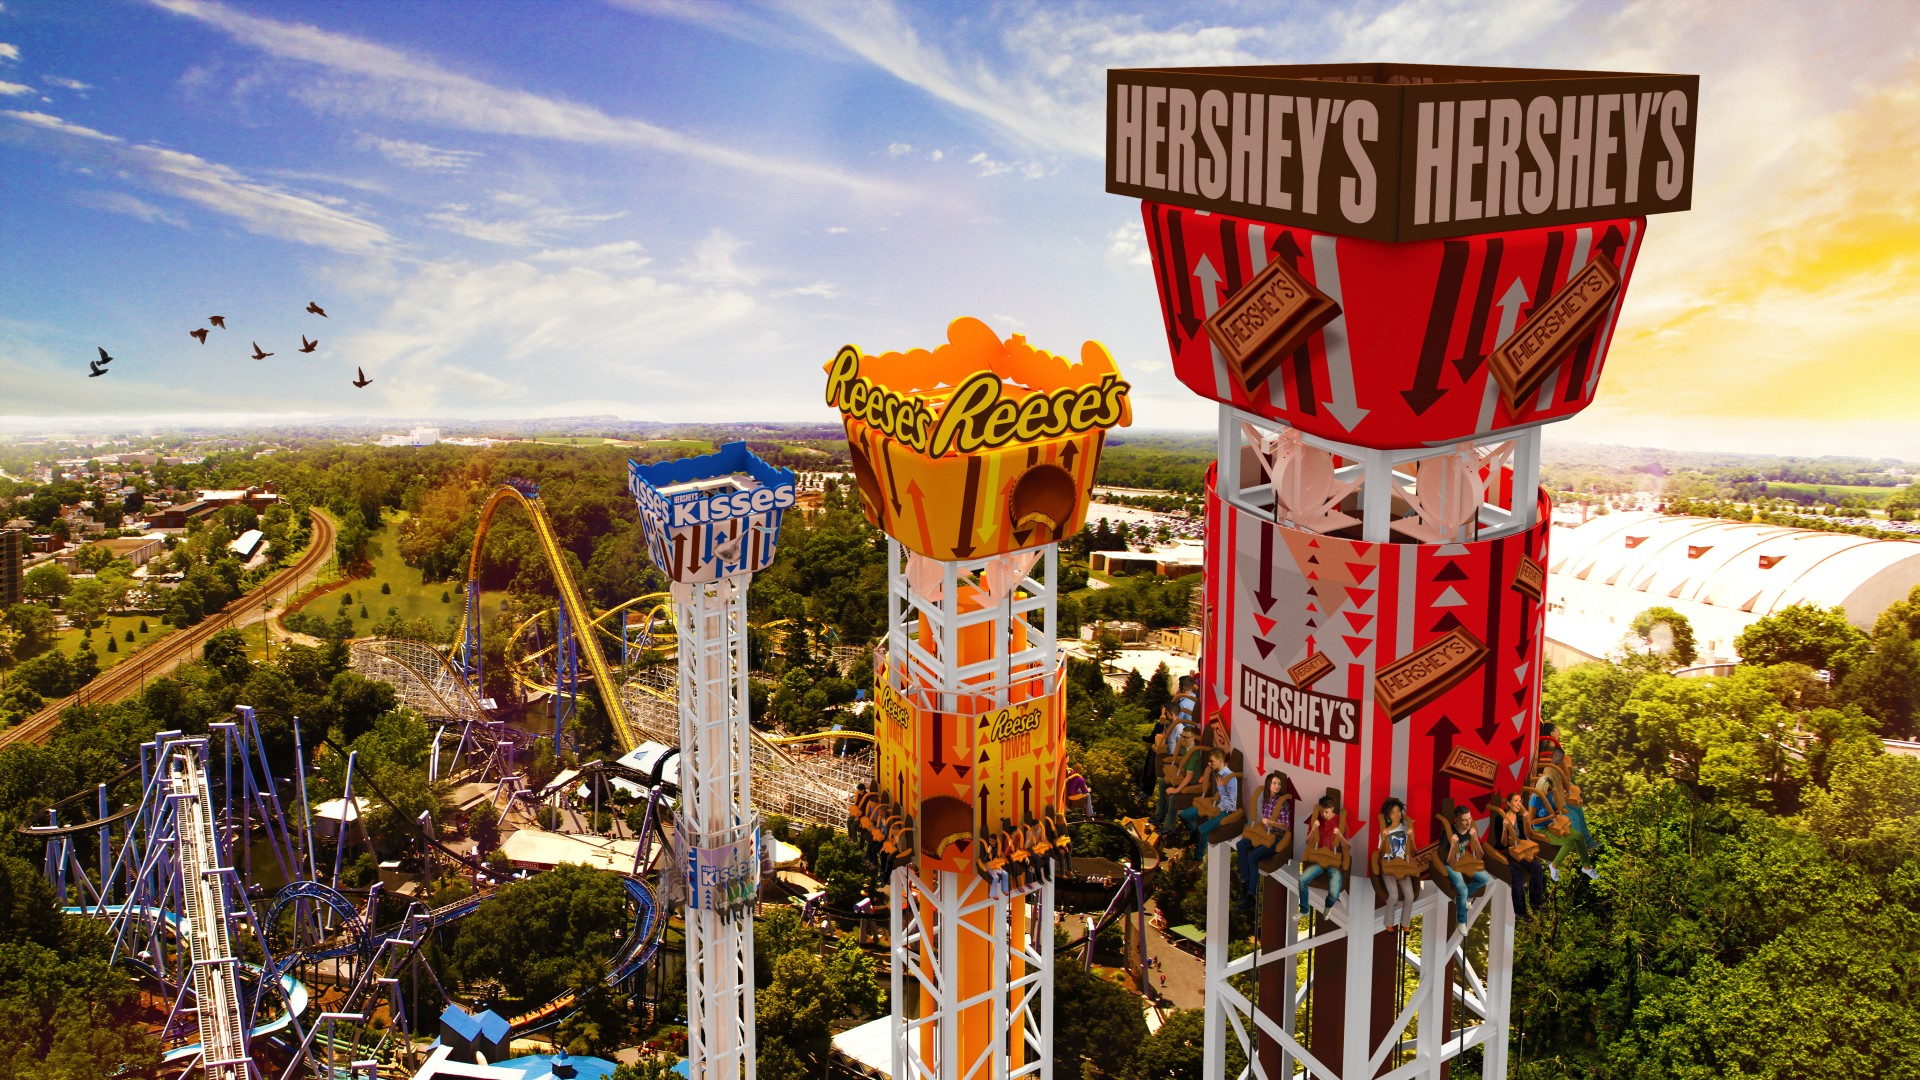 Philadelphia In The Fall Wallpaper Hersheypark Announces Hershey Triple Tower Opening In 2017